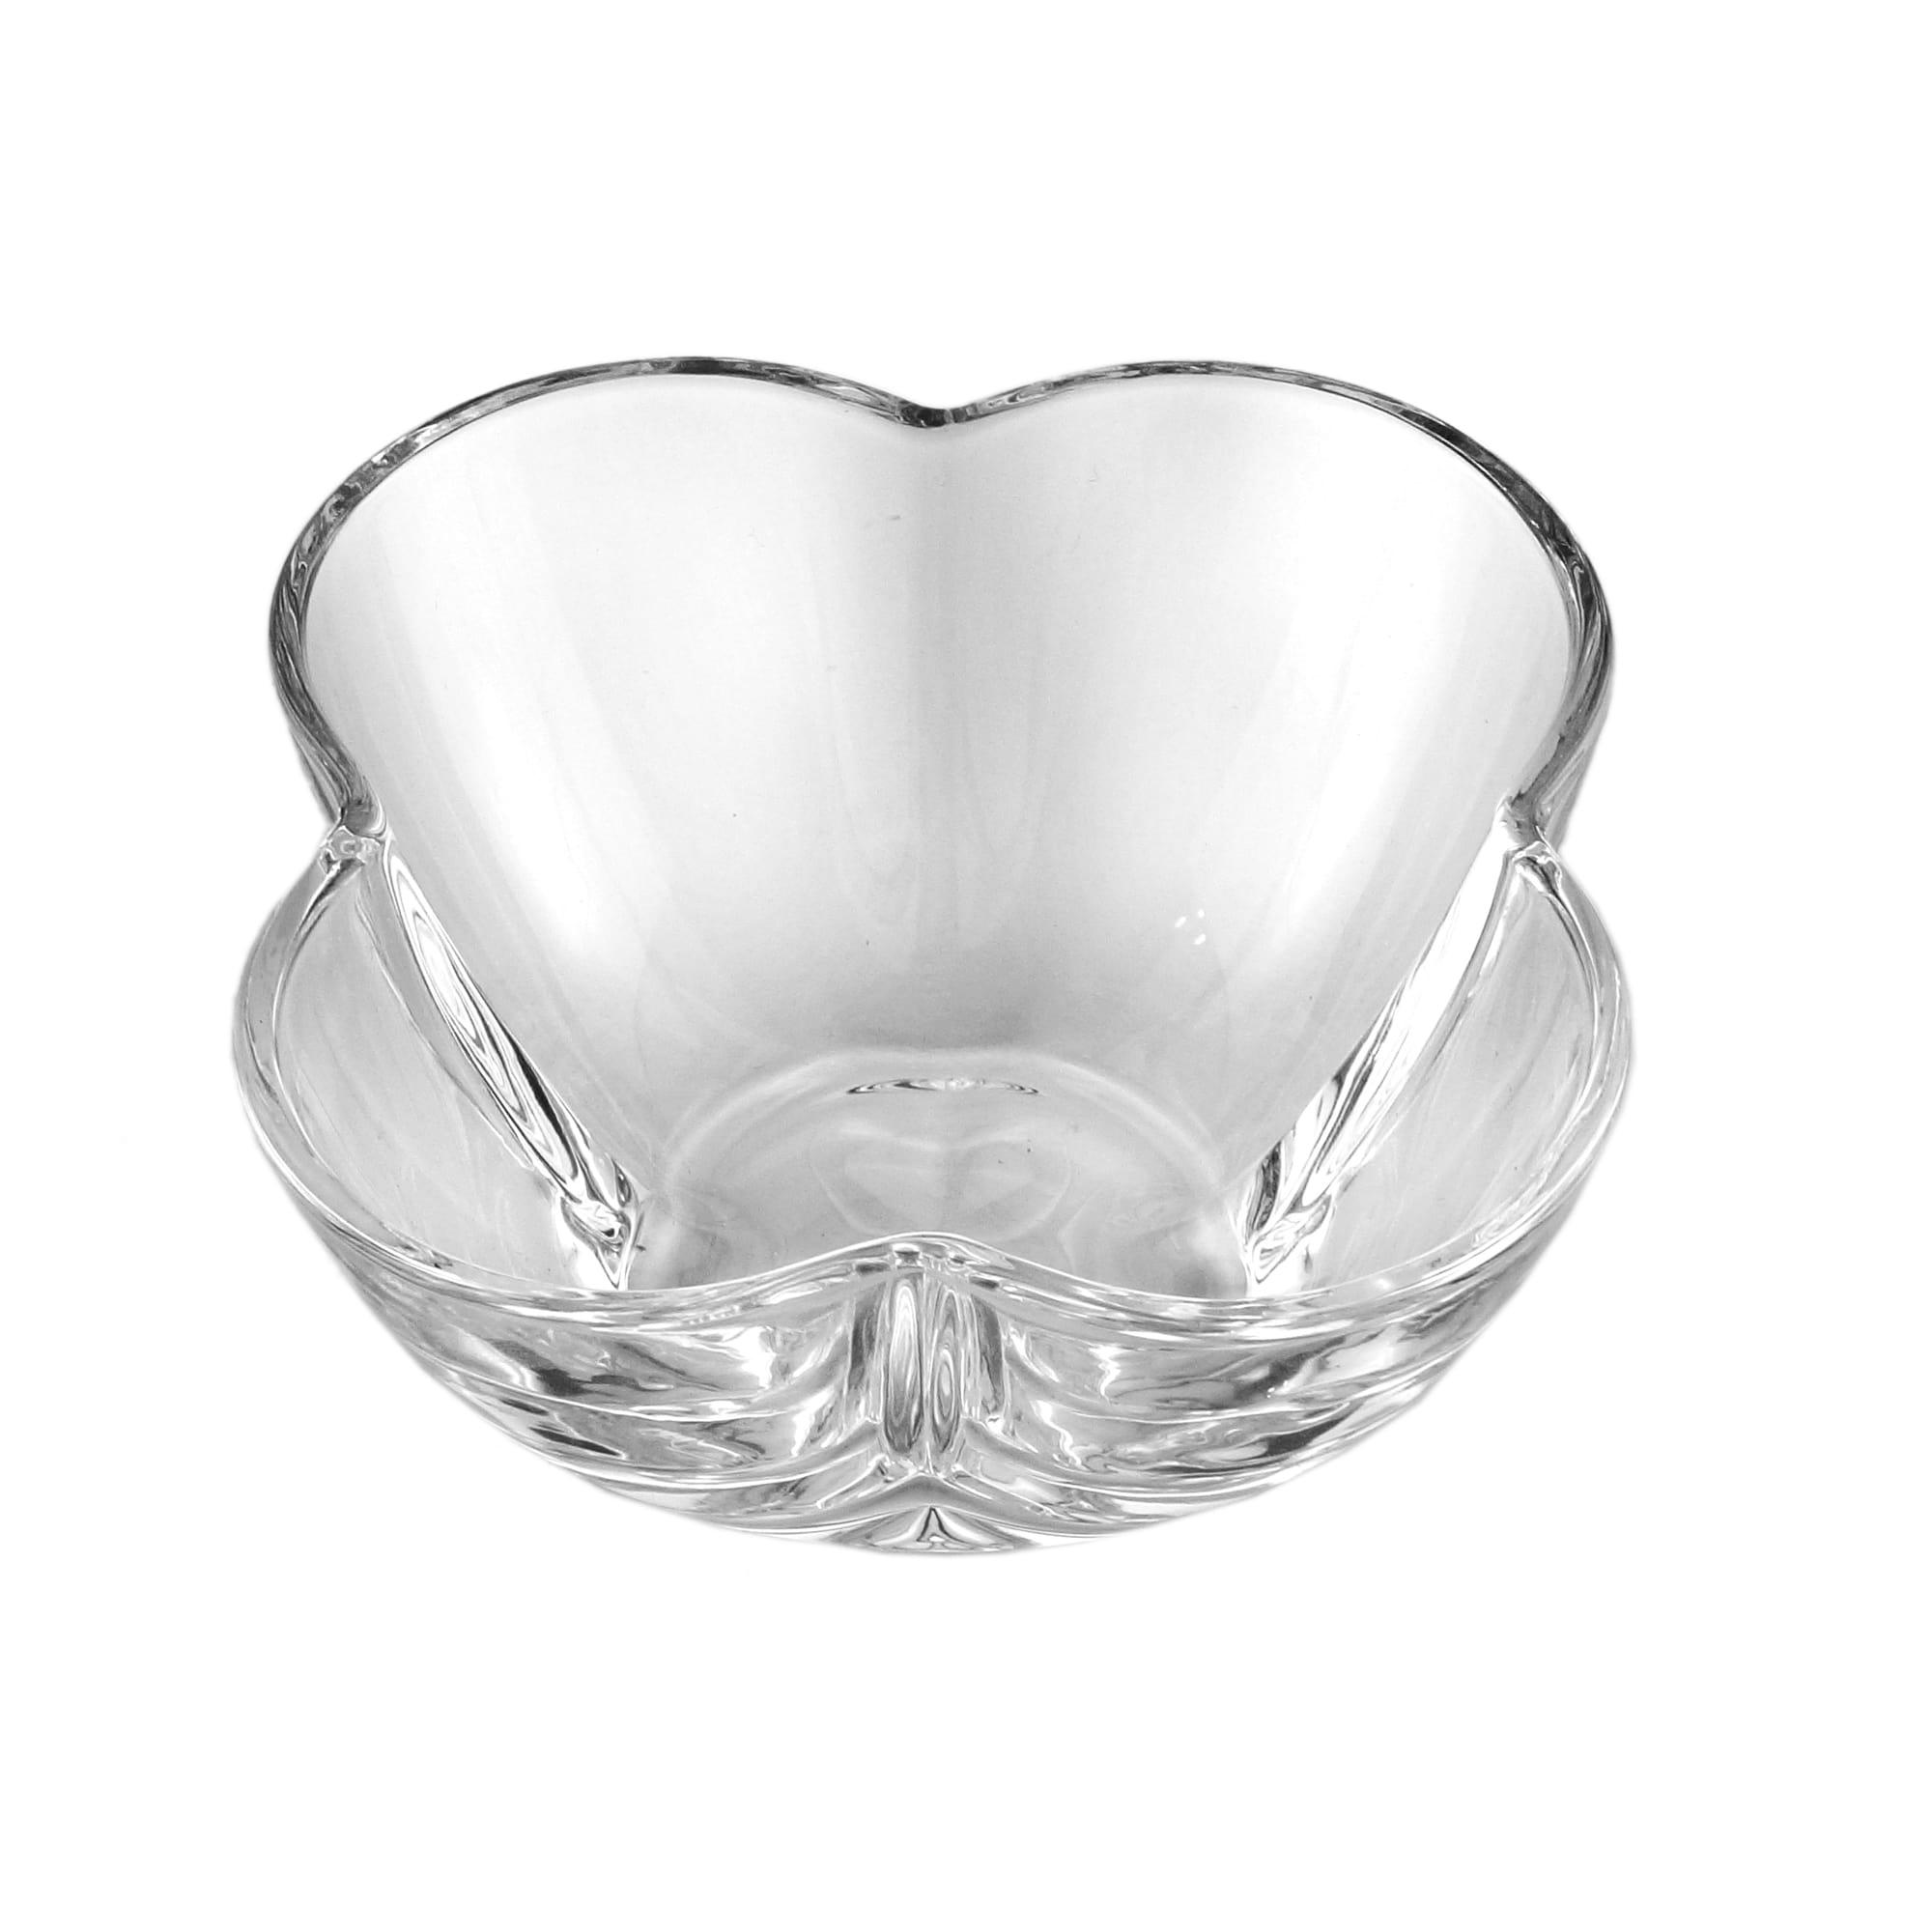 Conjunto 4 Bowls de Cristal de chumbo Clover  9 x 5 cm